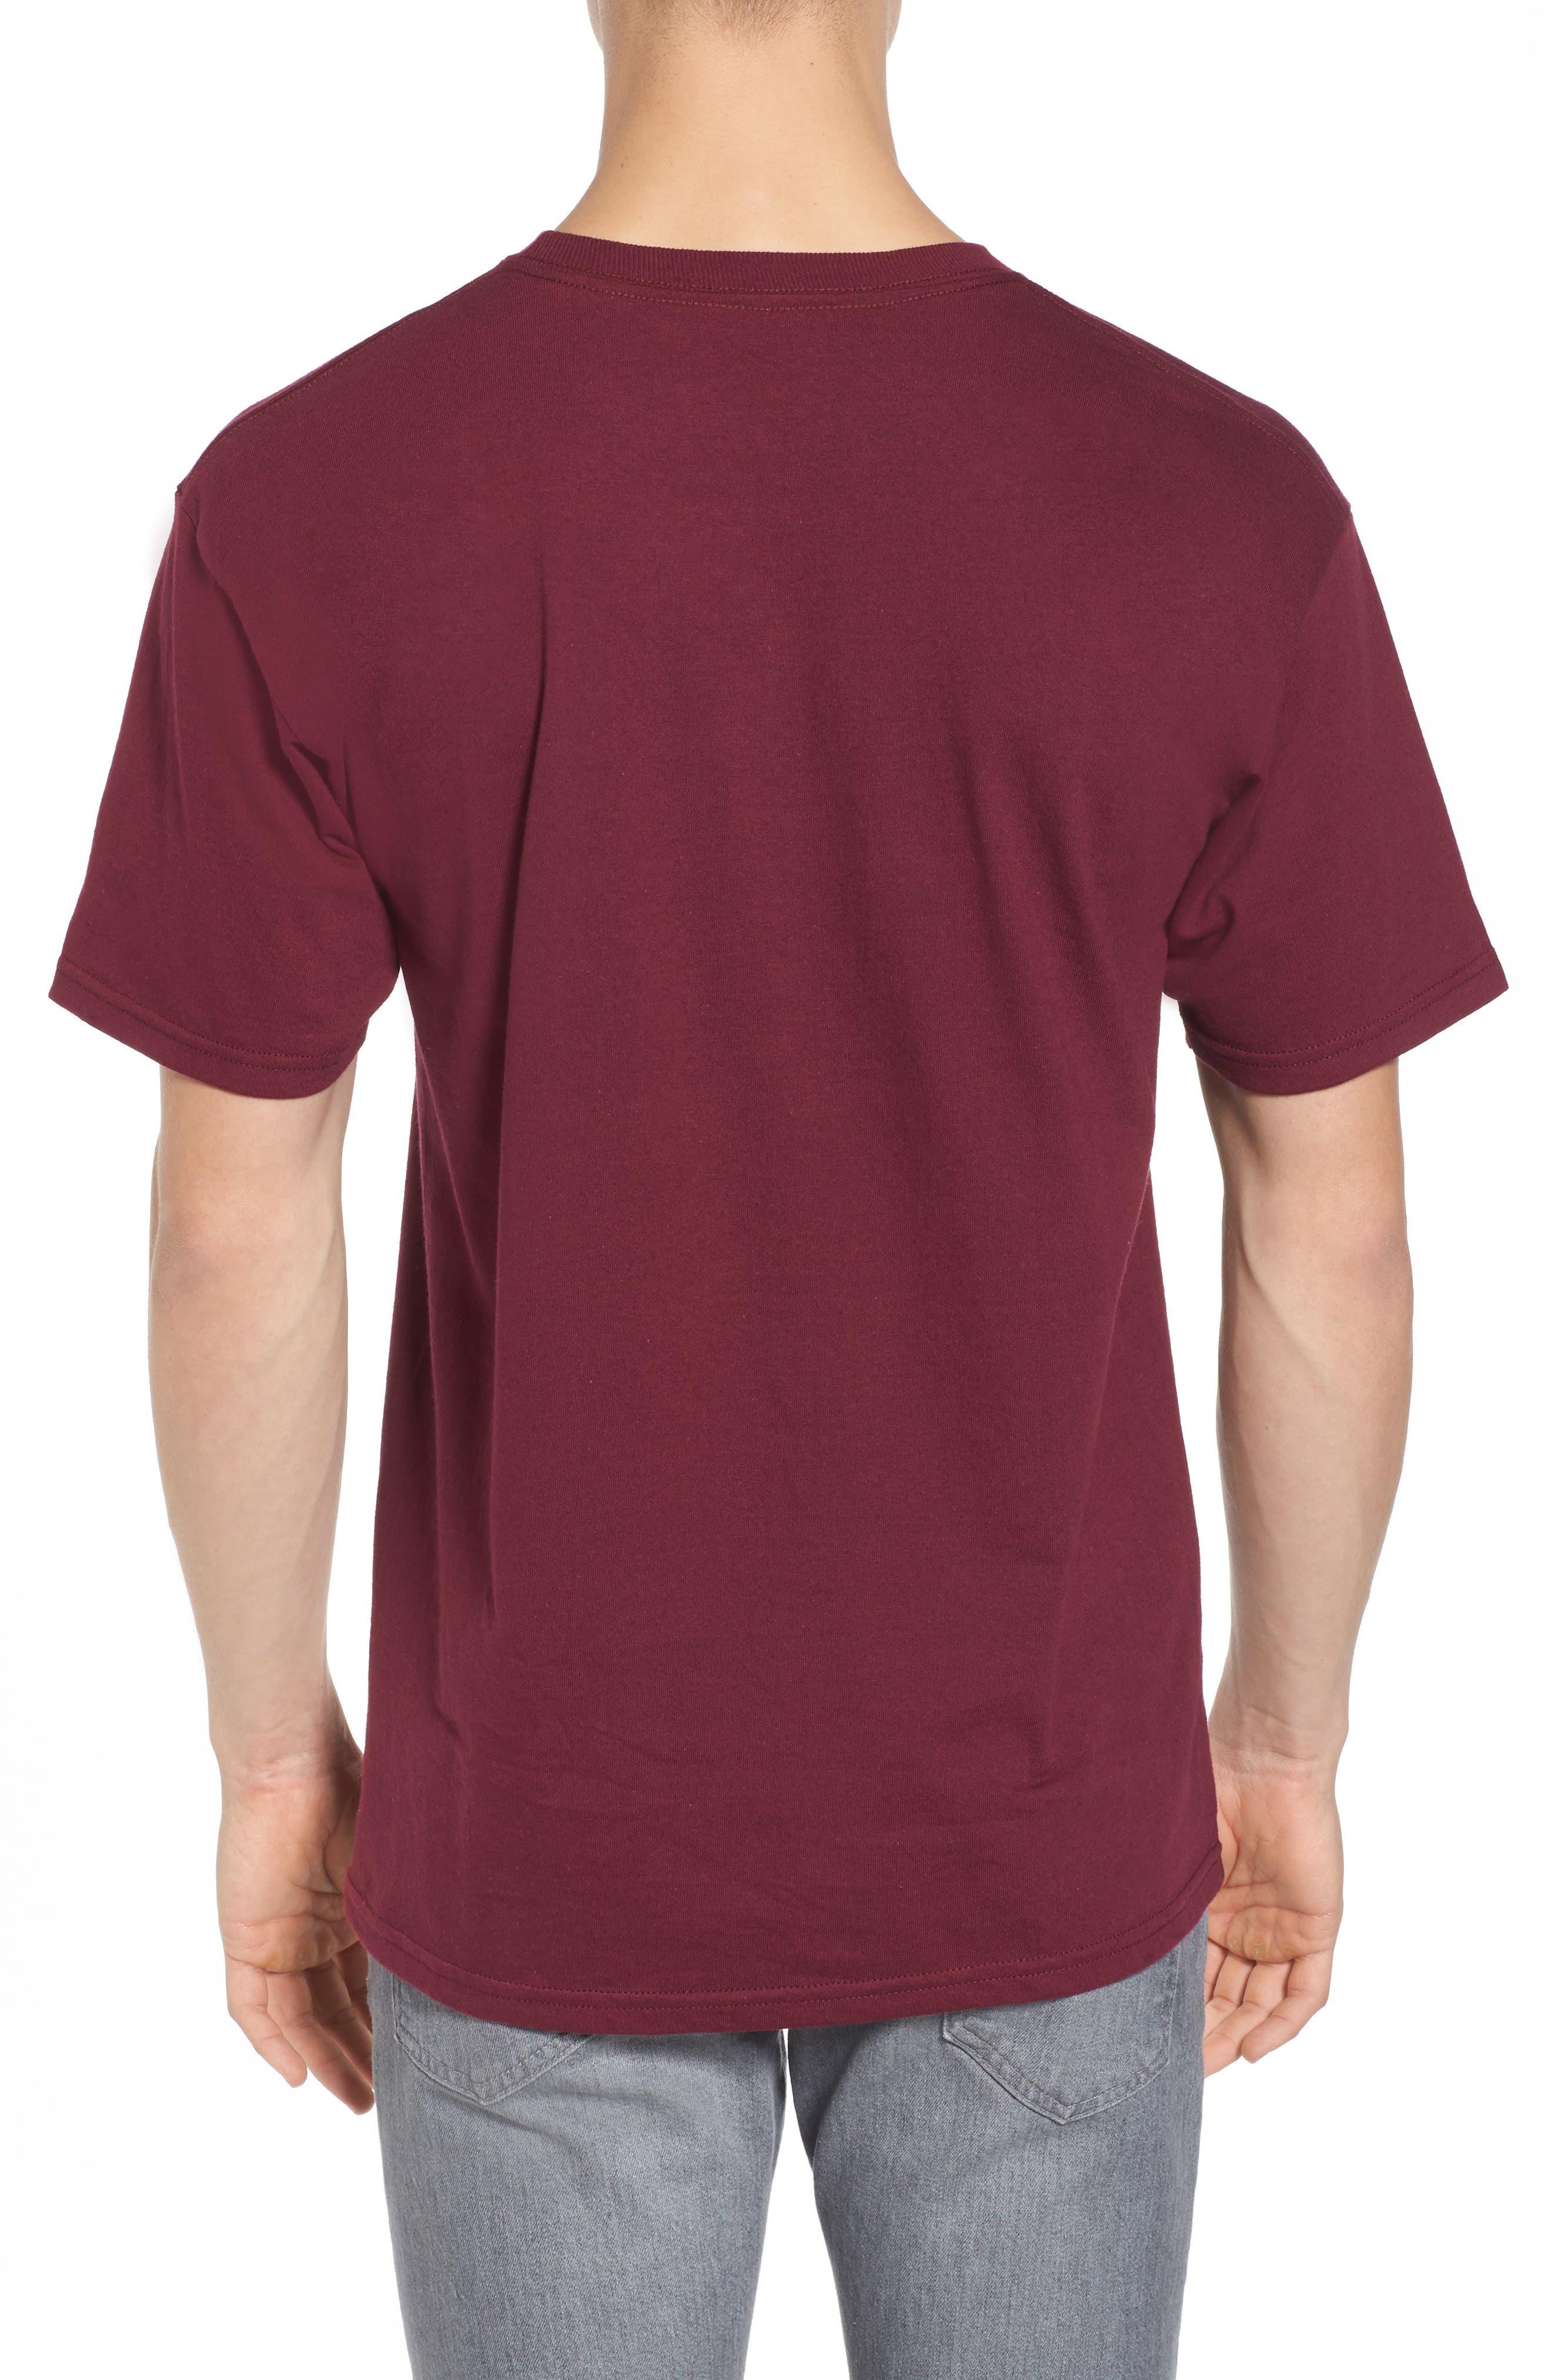 '95 T-Shirt,                             Alternate thumbnail 2, color,                             Navy/ Silver Birch/ White